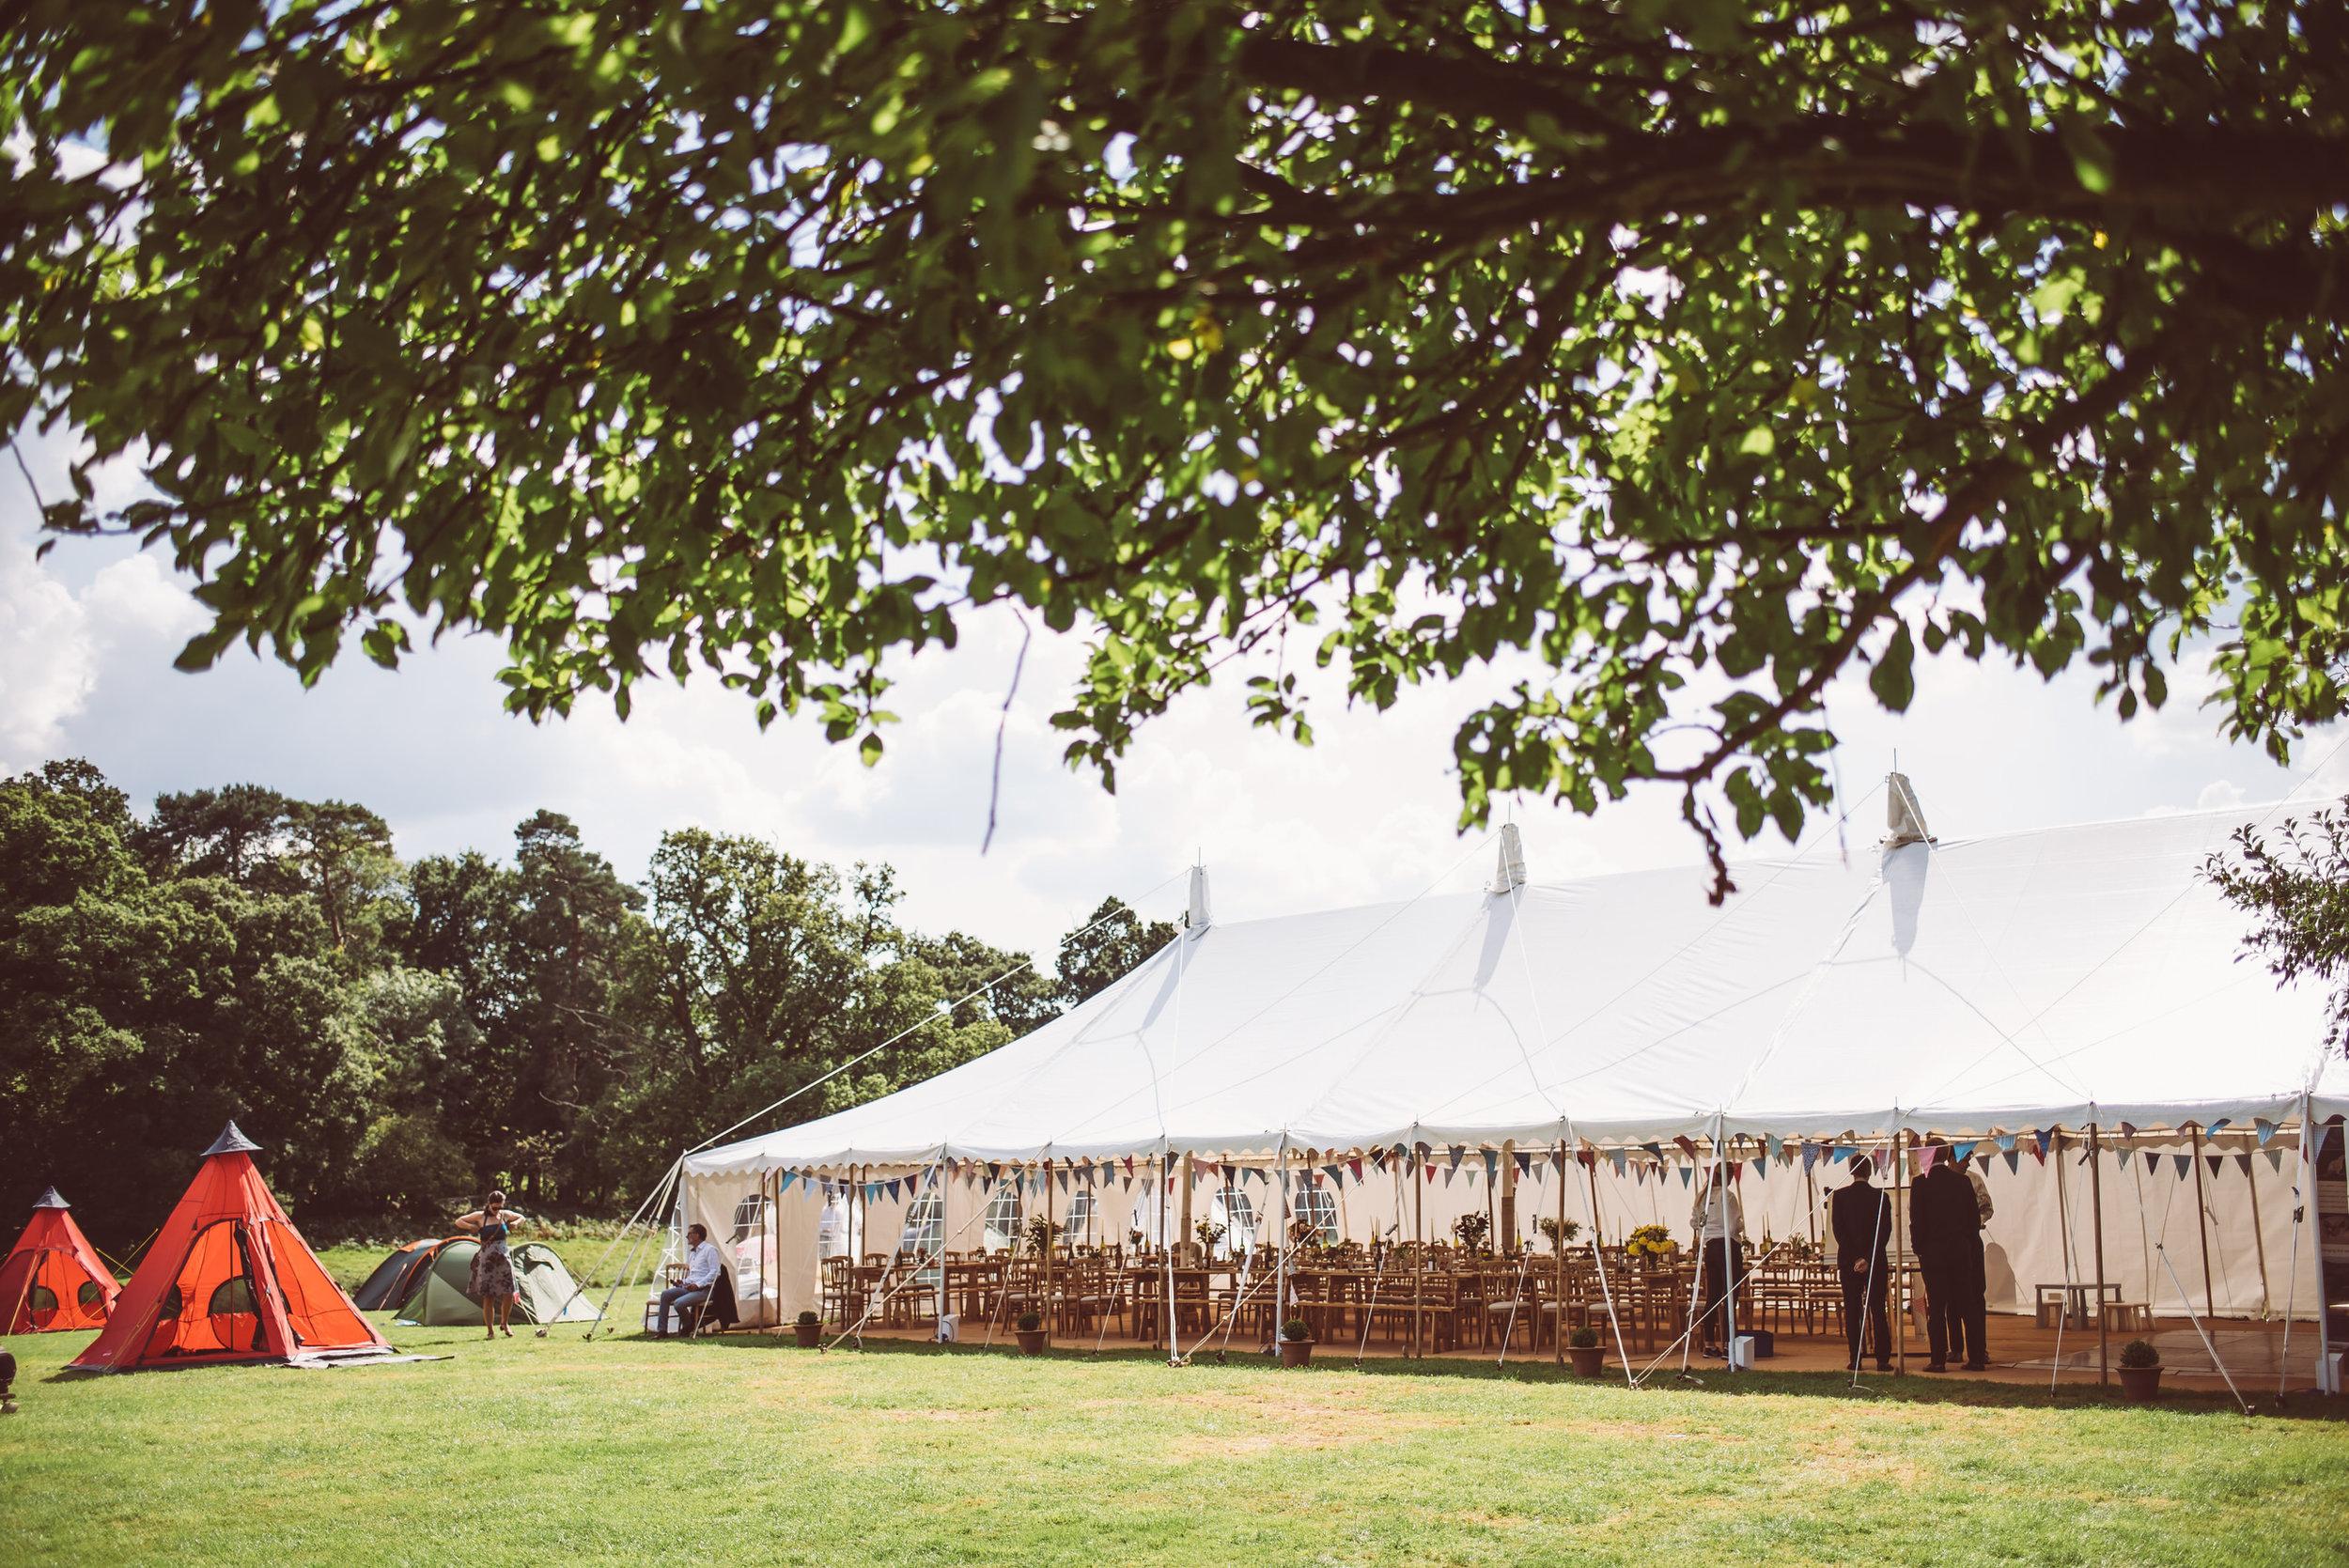 knepp-castle-boho-outdoor-wedding-21.jpg